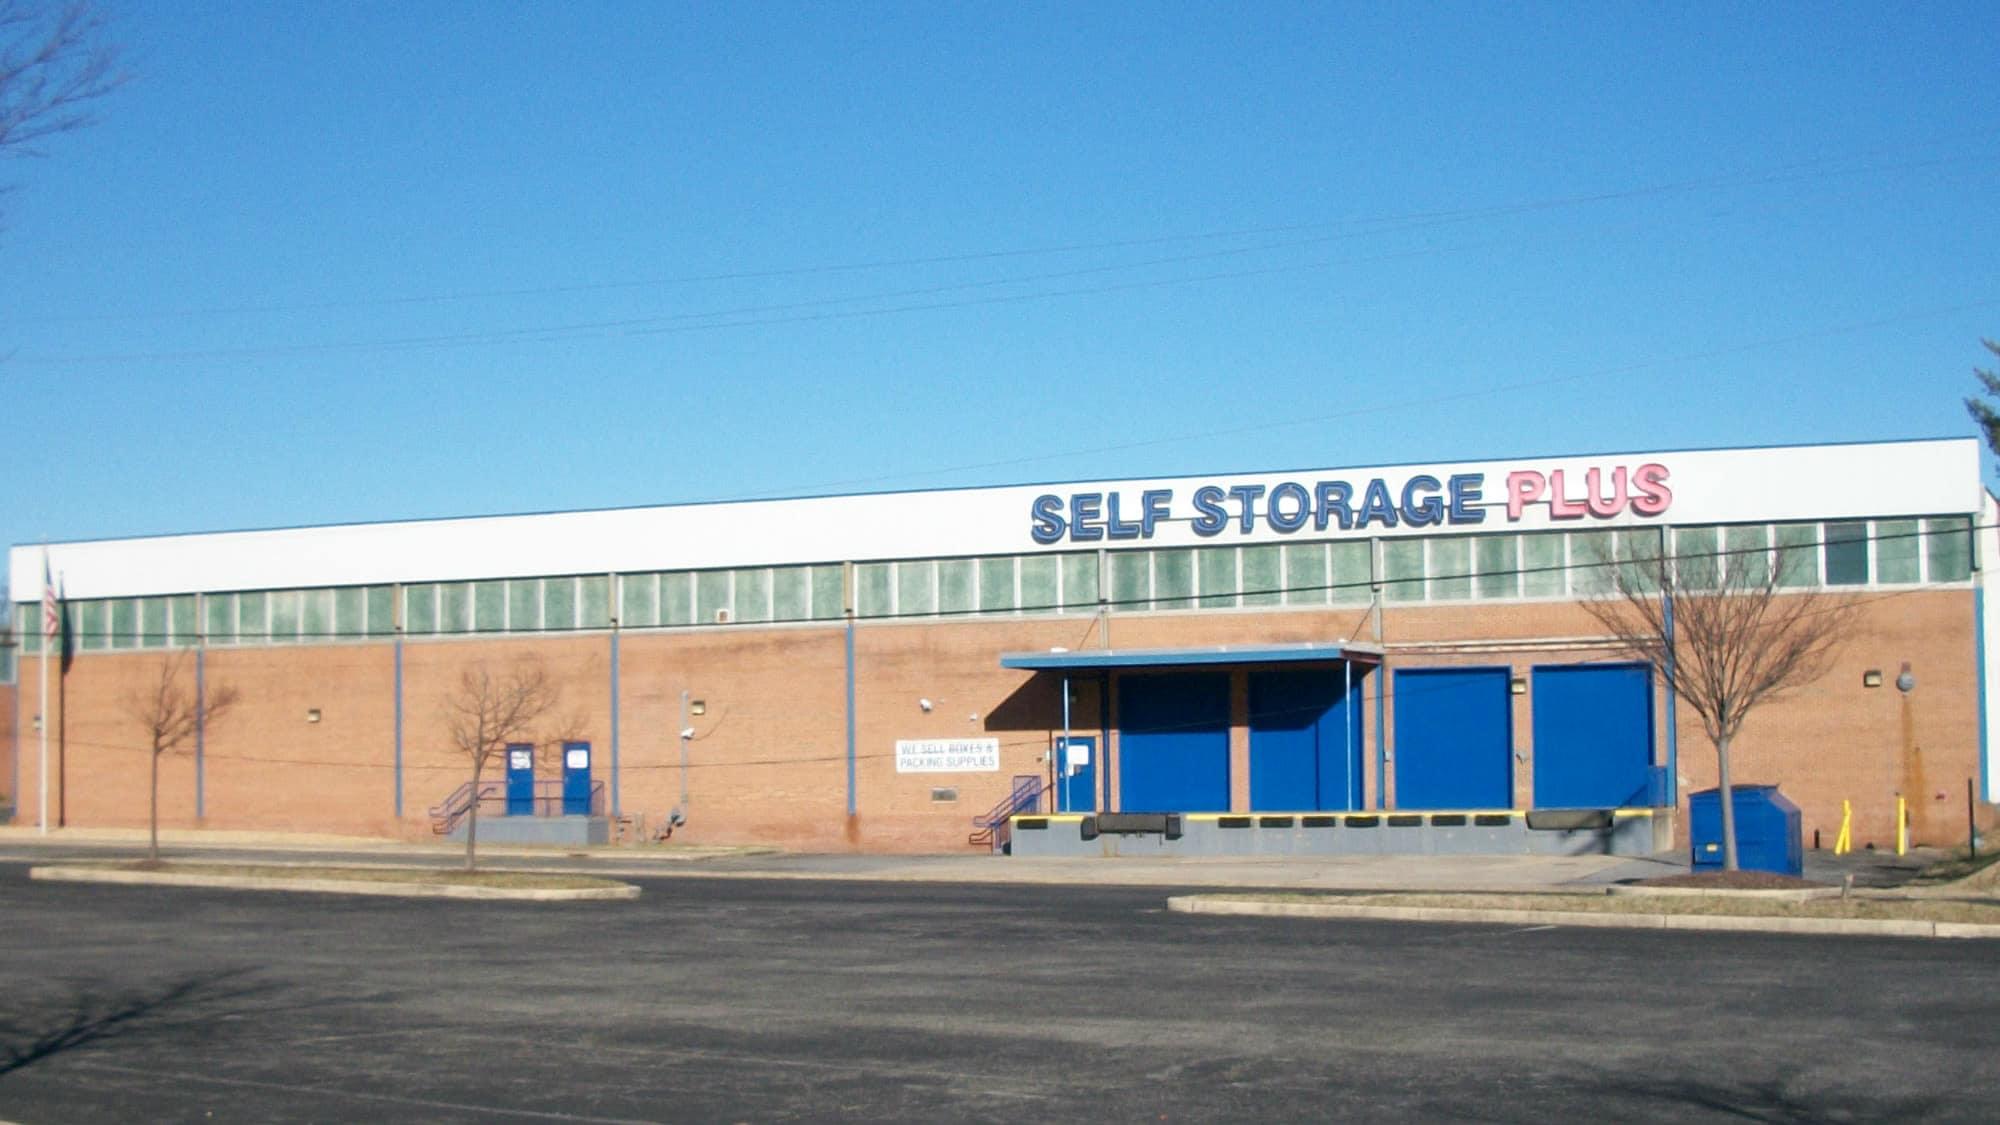 Loading dock at Self Storage Plus in Lanham, MD